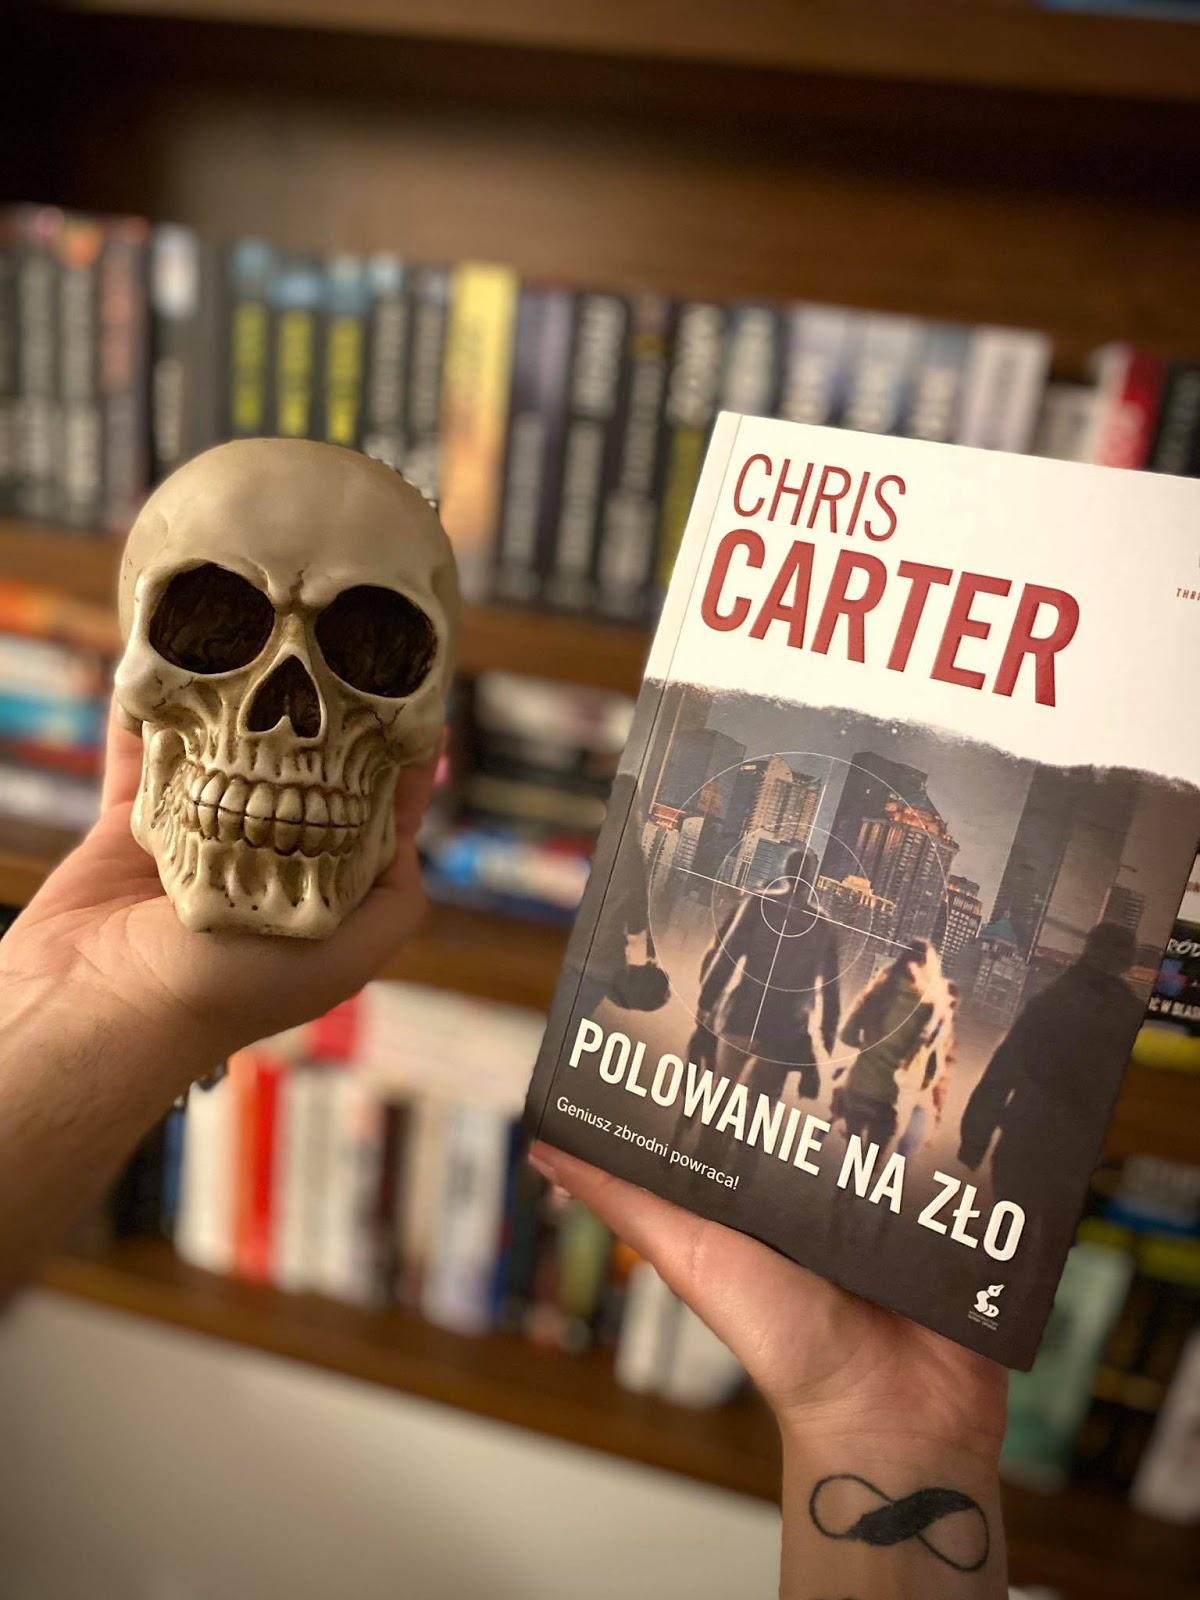 Chris Carter - Polowanie na zło